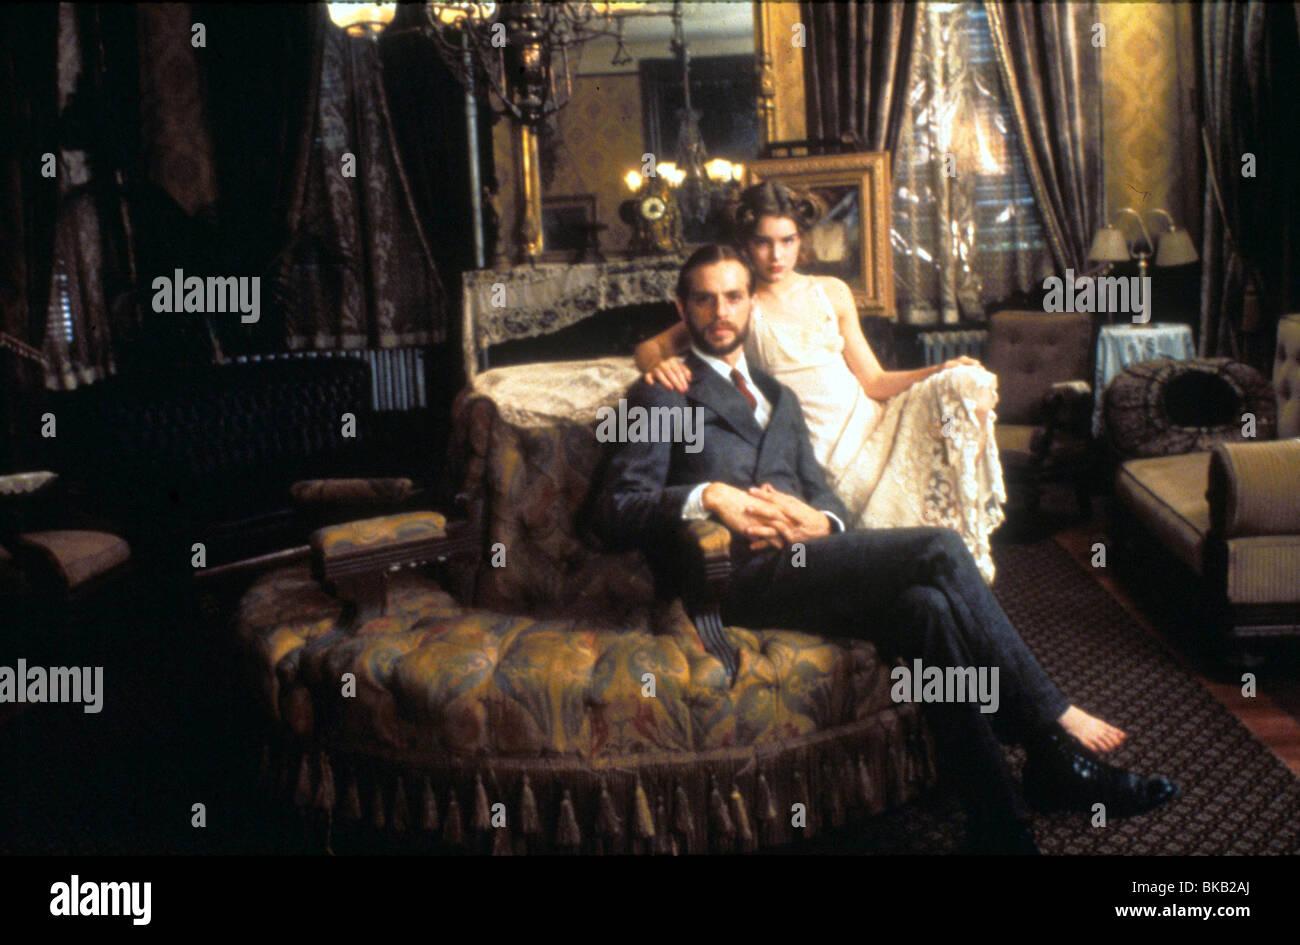 PRETTY BABY (1977) KEITH CARRADINE, BROOKE SHIELDS PPRB 010   Stock Image